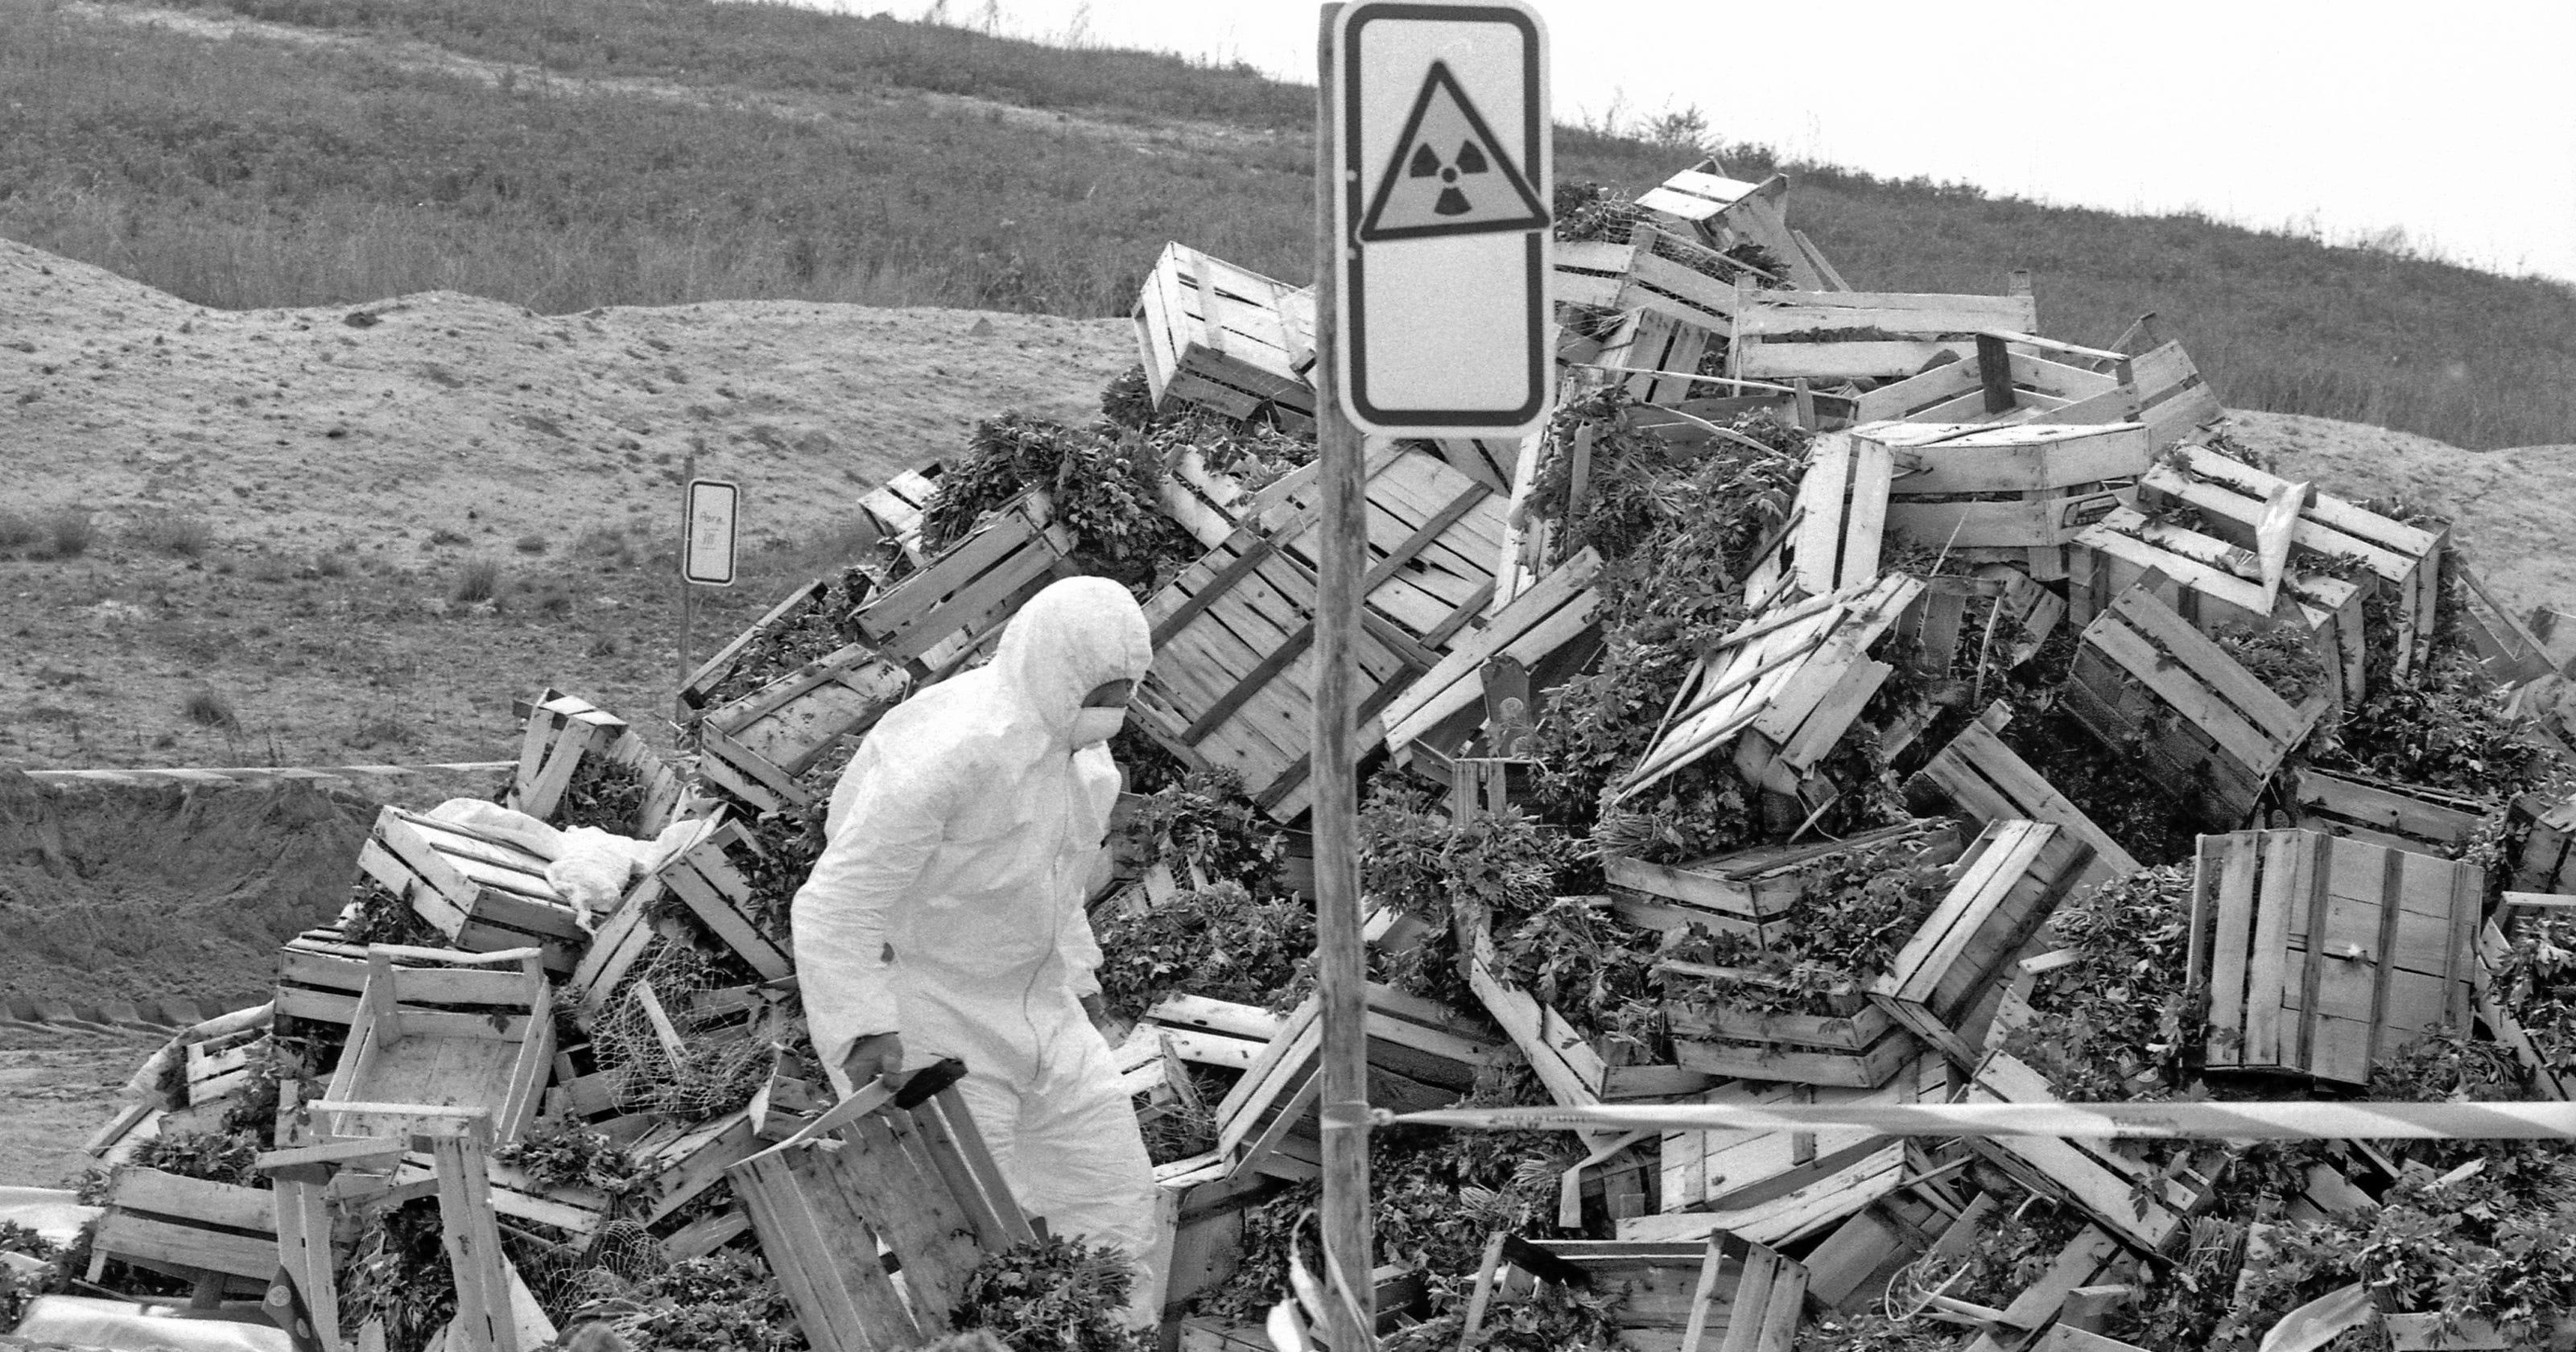 Chernobyl to produce power again: Solar plant plan for ... |Chernobyl Reactor Meltdown